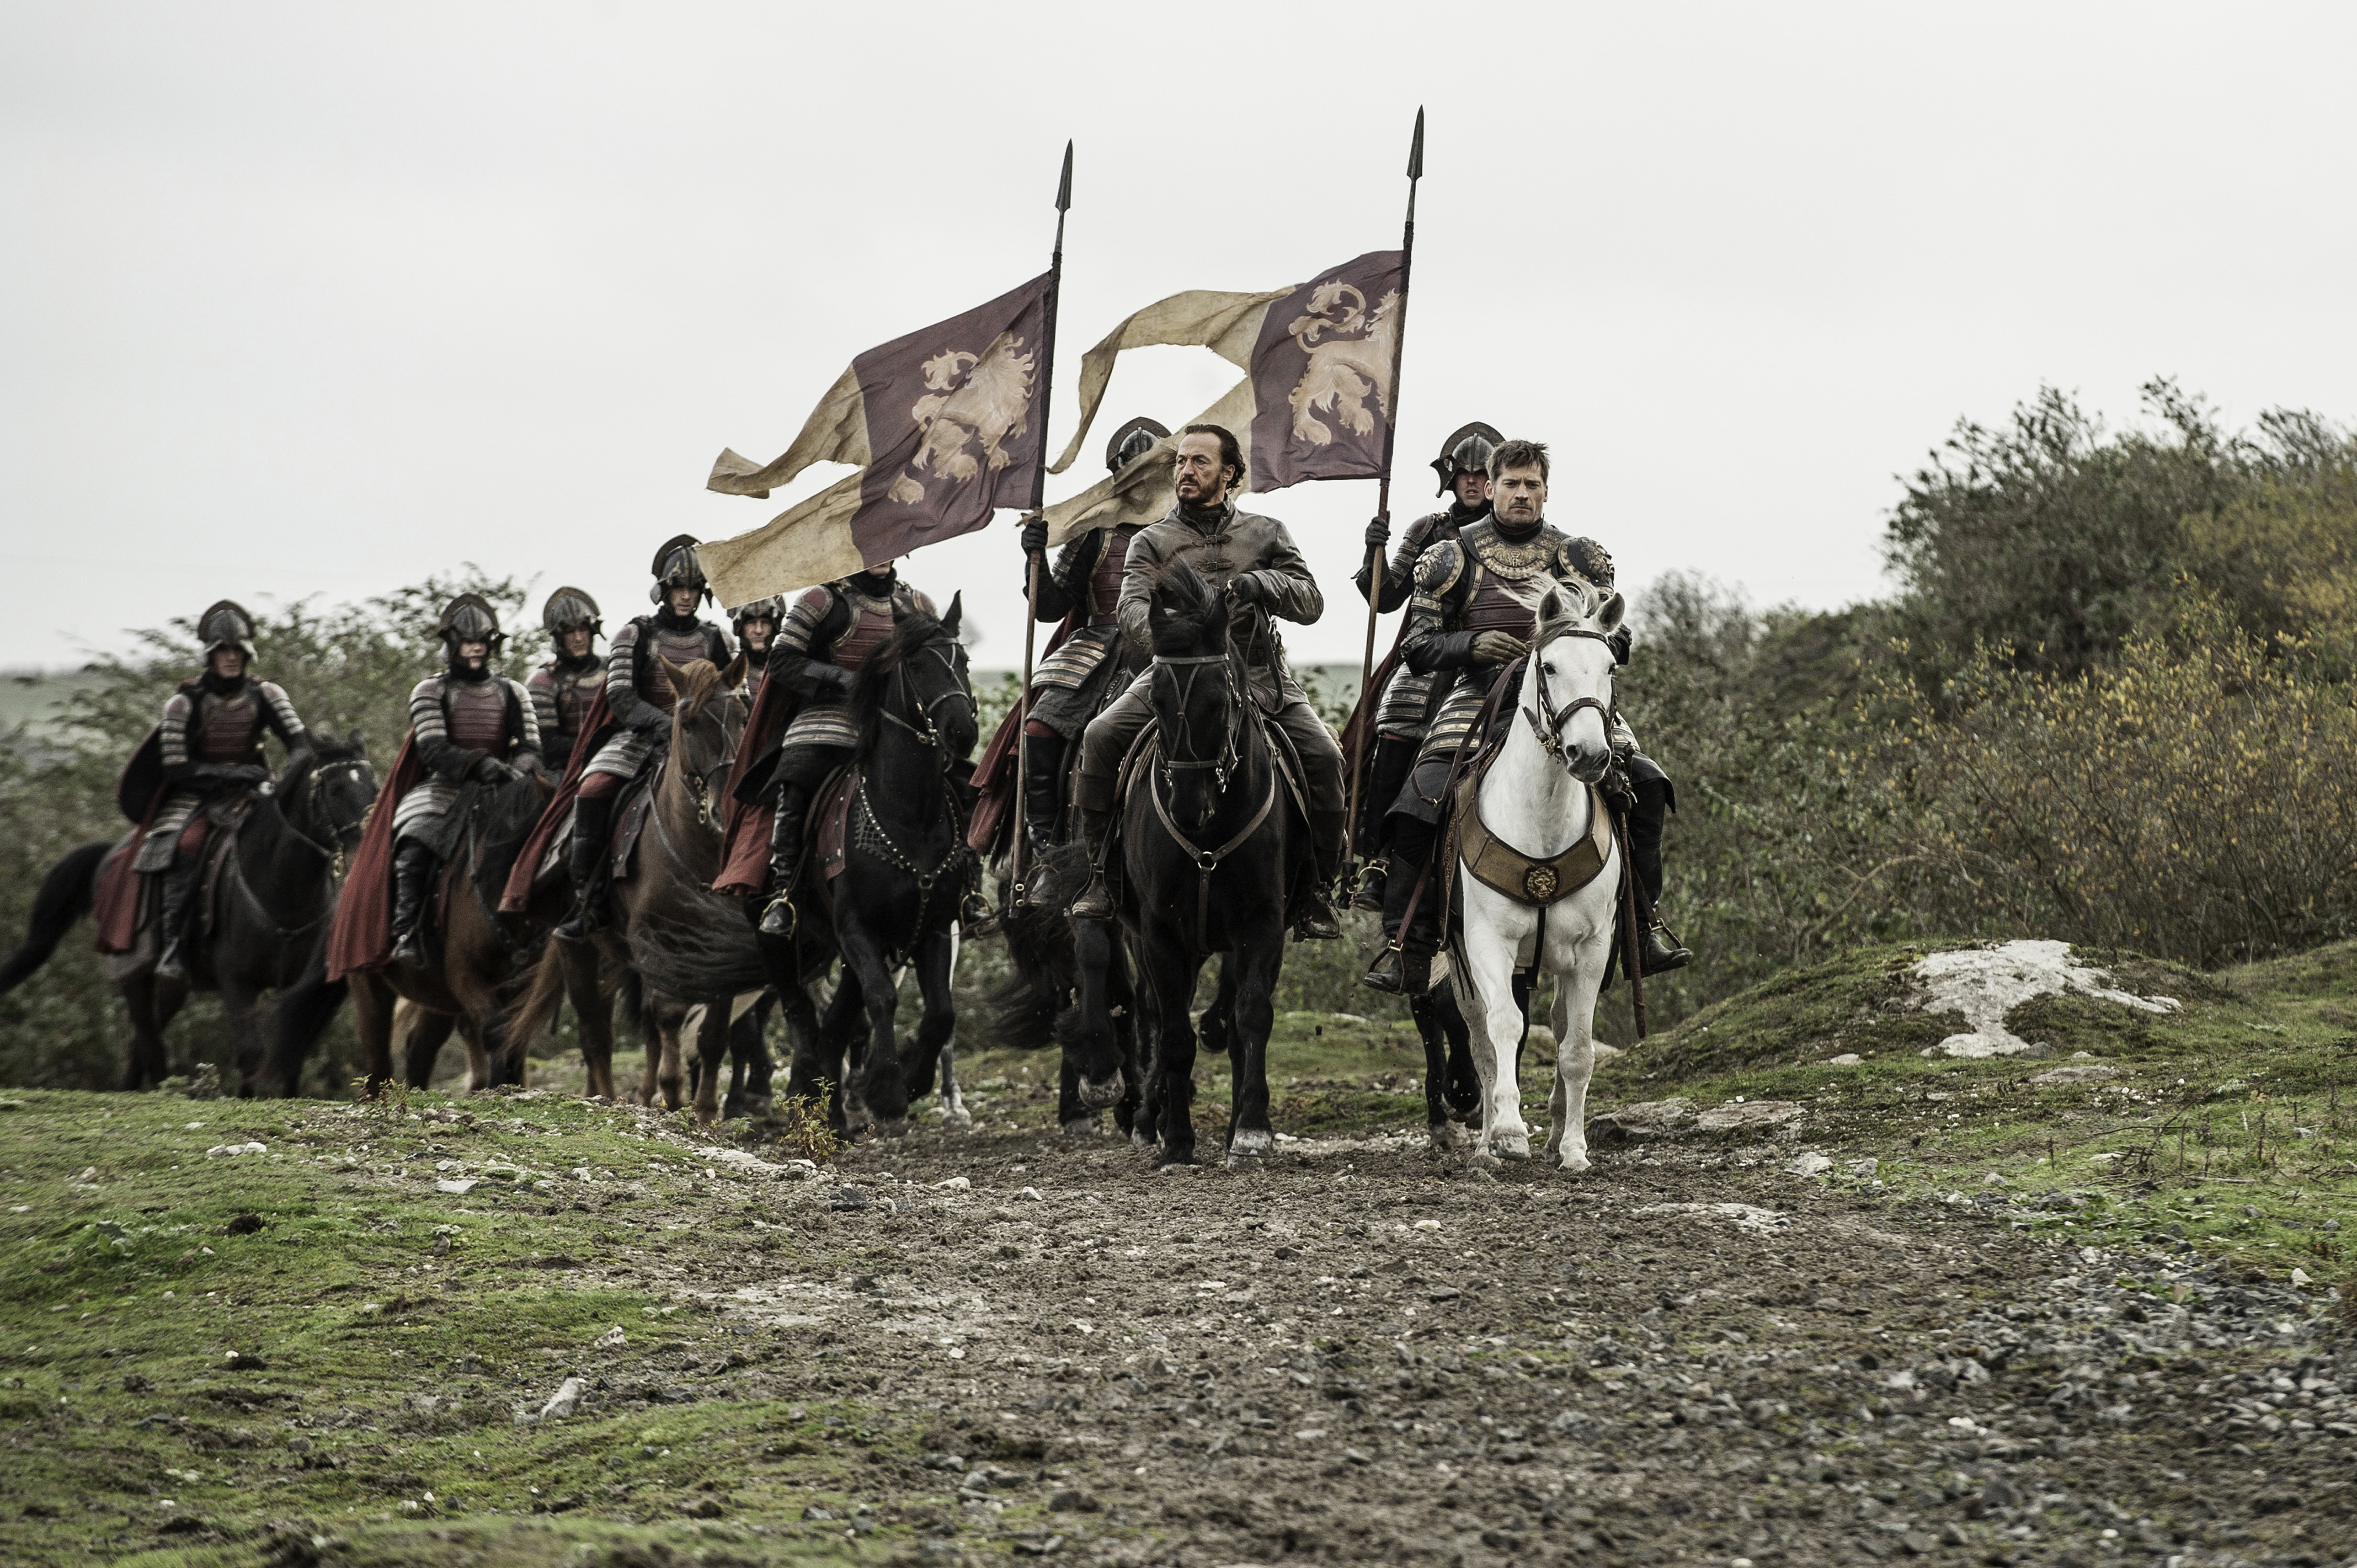 Jerome Flynn and Nikolaj Coster-Waldau. in Game of Thrones season 6, episode 10.